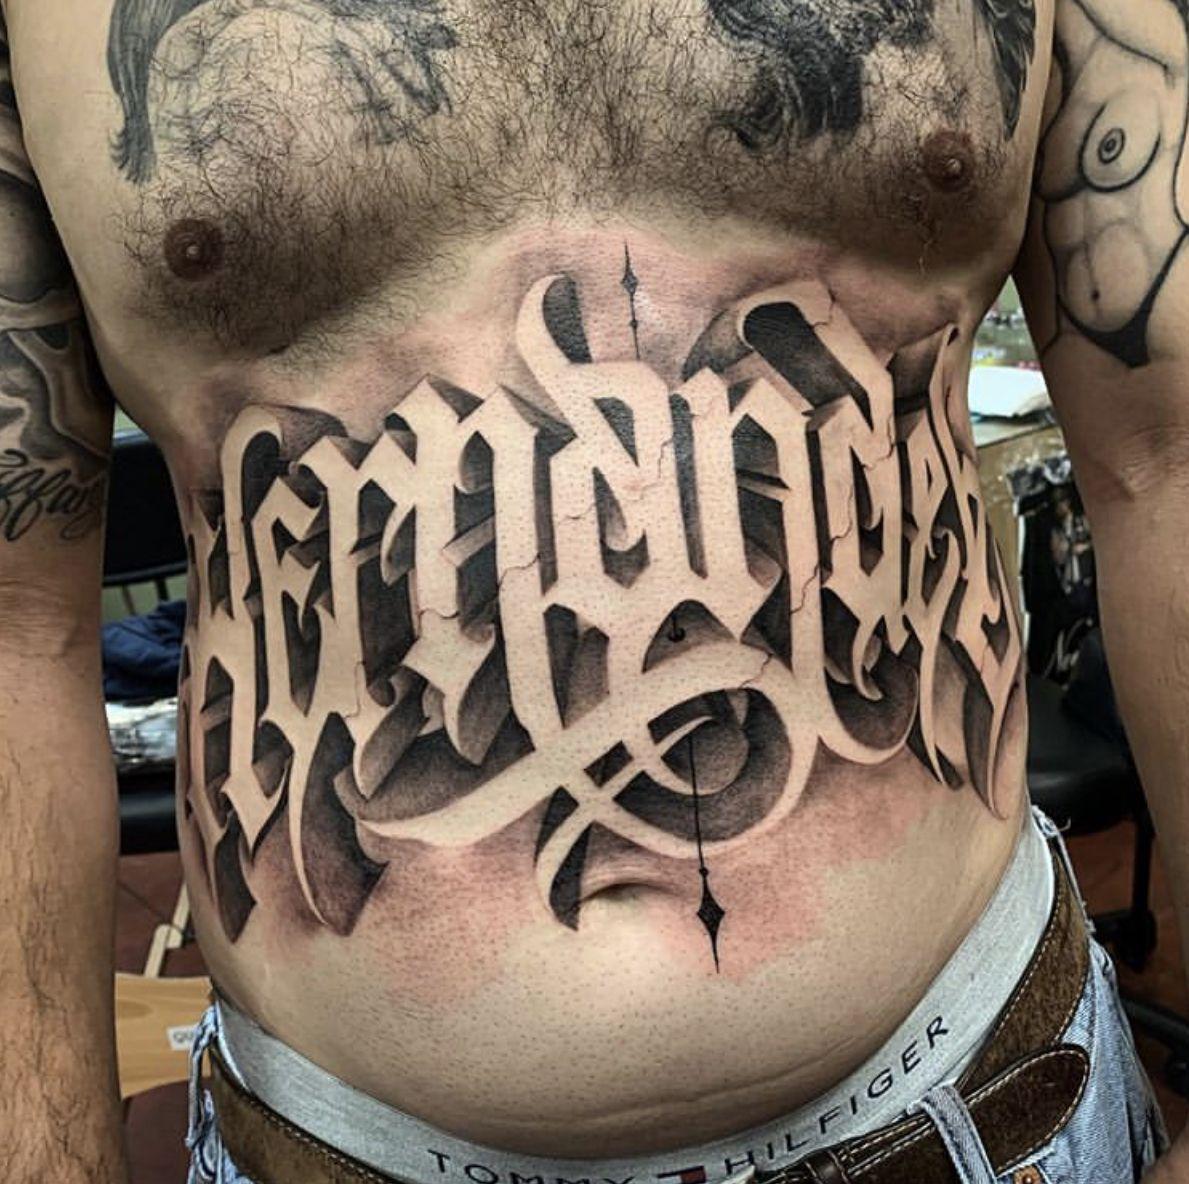 Pin De Eva Yackovskaya En Primery Lettering Tatu Letras De Chicano Tatuaje En La Panza Letras Para Tatuajes